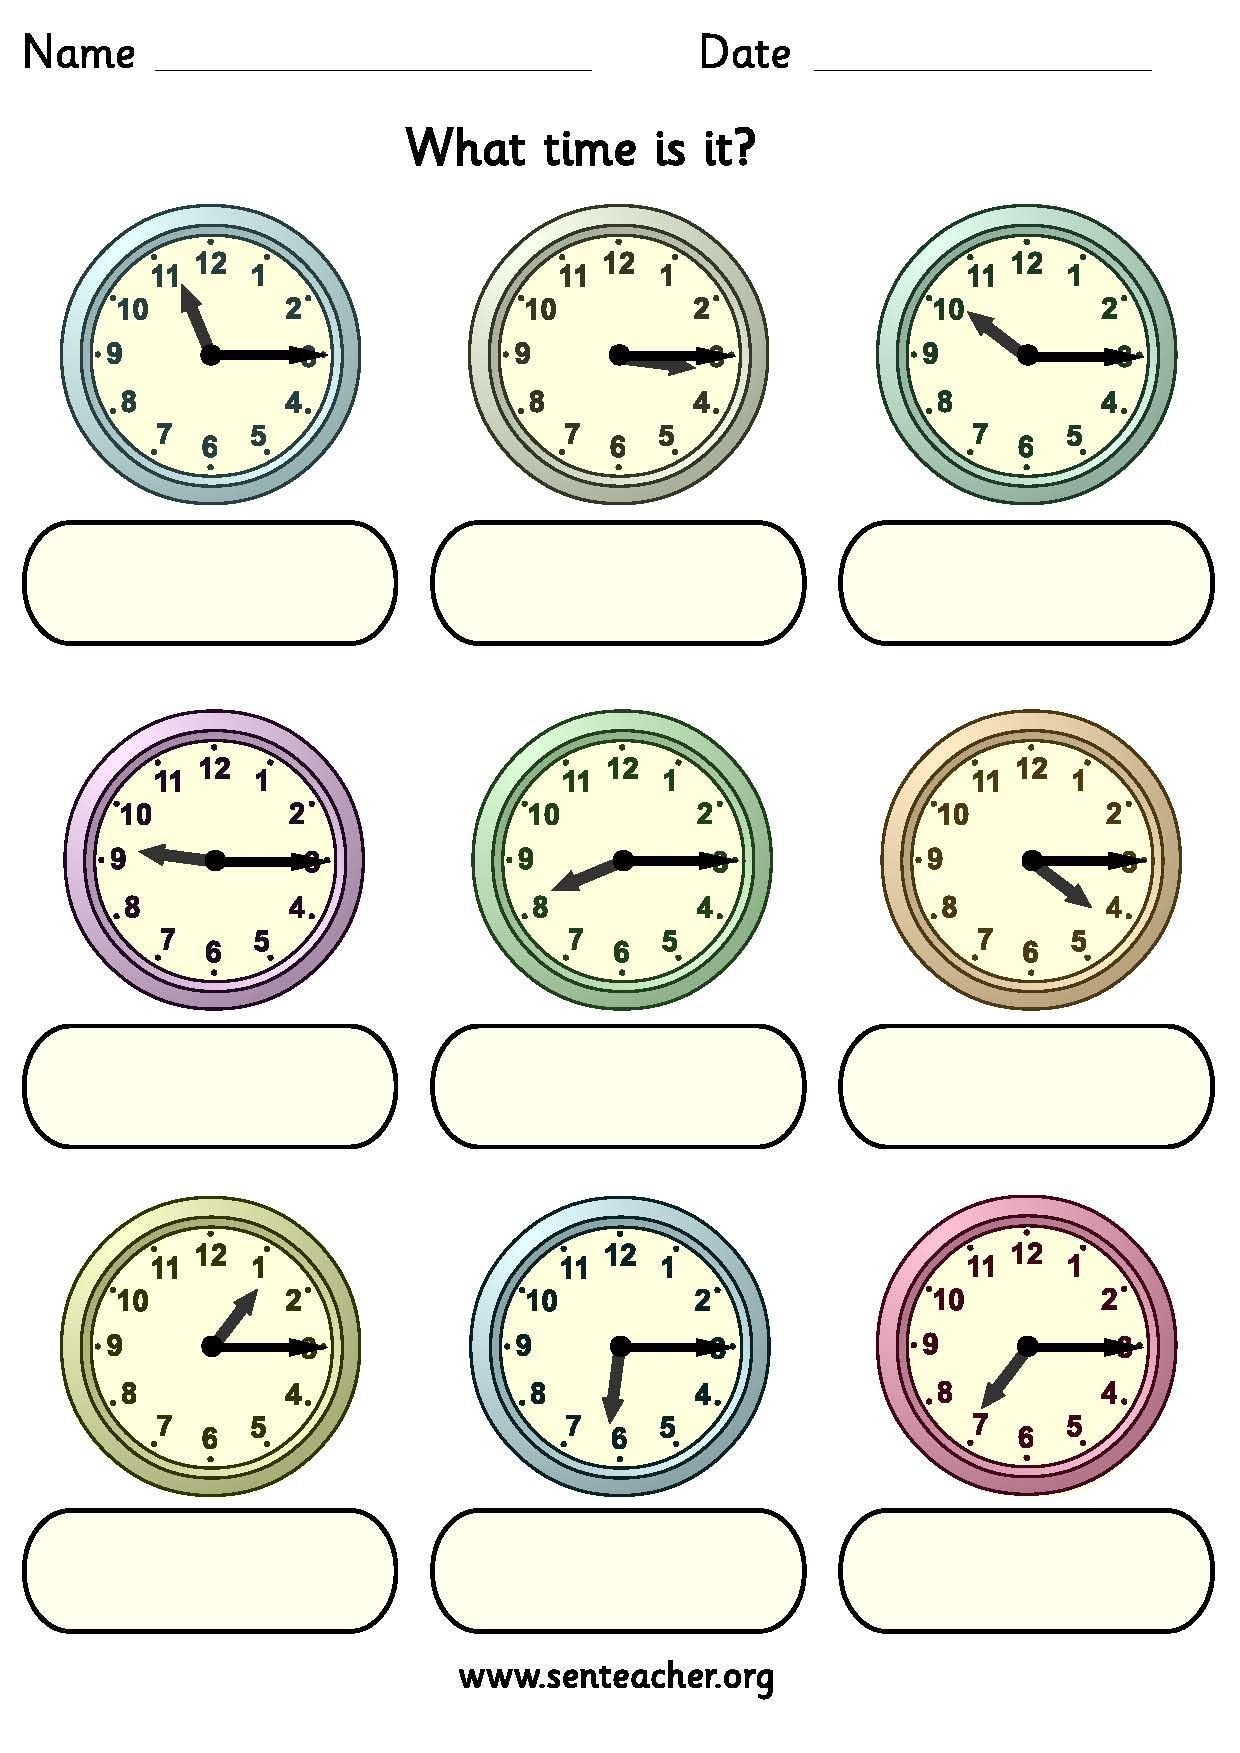 Worksheet Containing 9ogue Clocks Showing Quarter